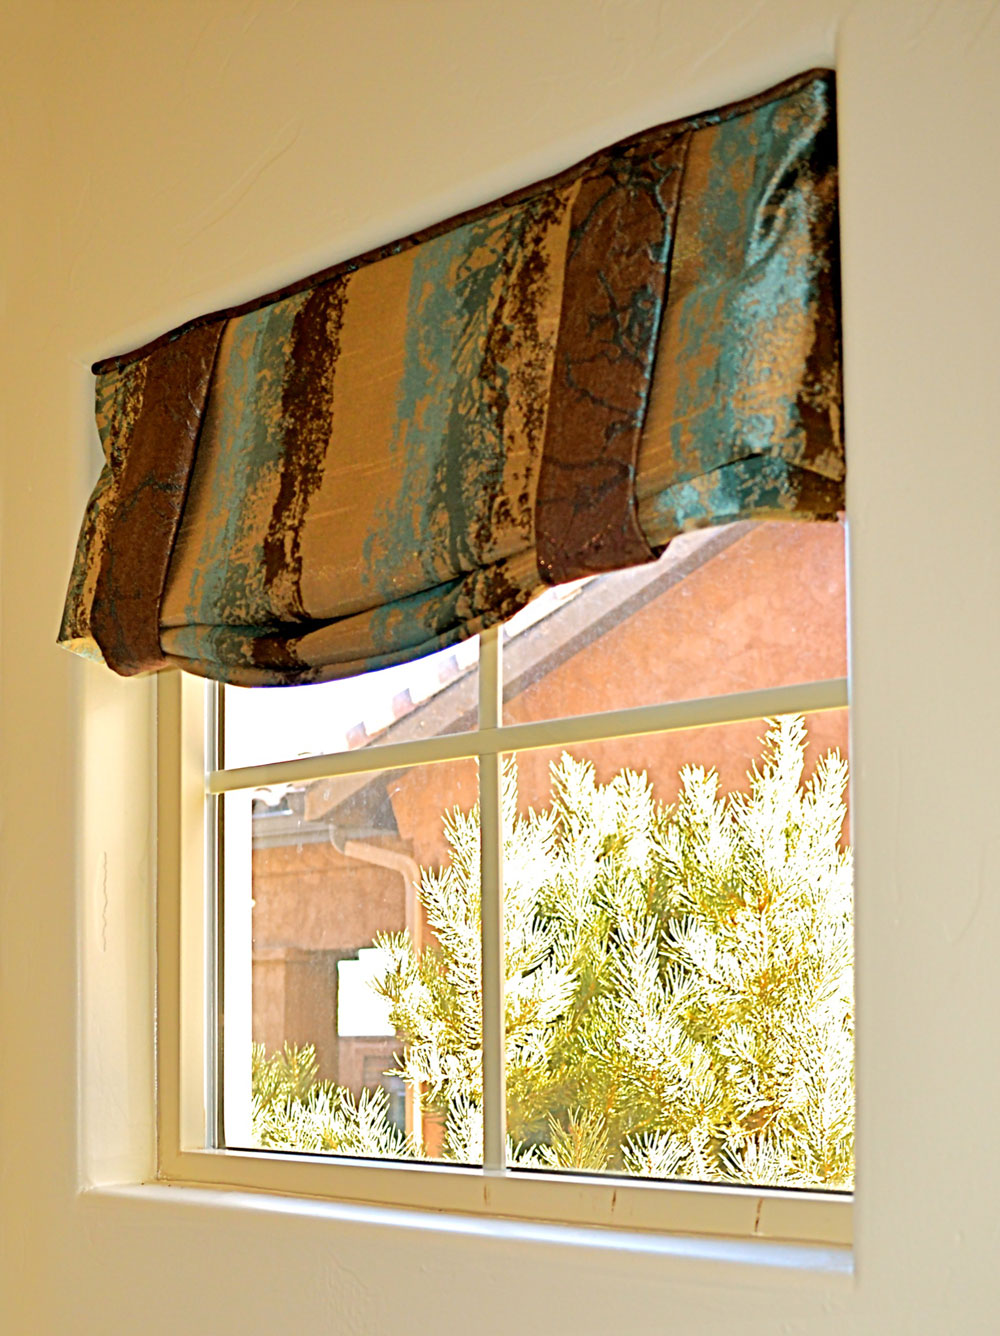 custom-drapery-colorado-springs-window-cover-turquoise-brown.jpg